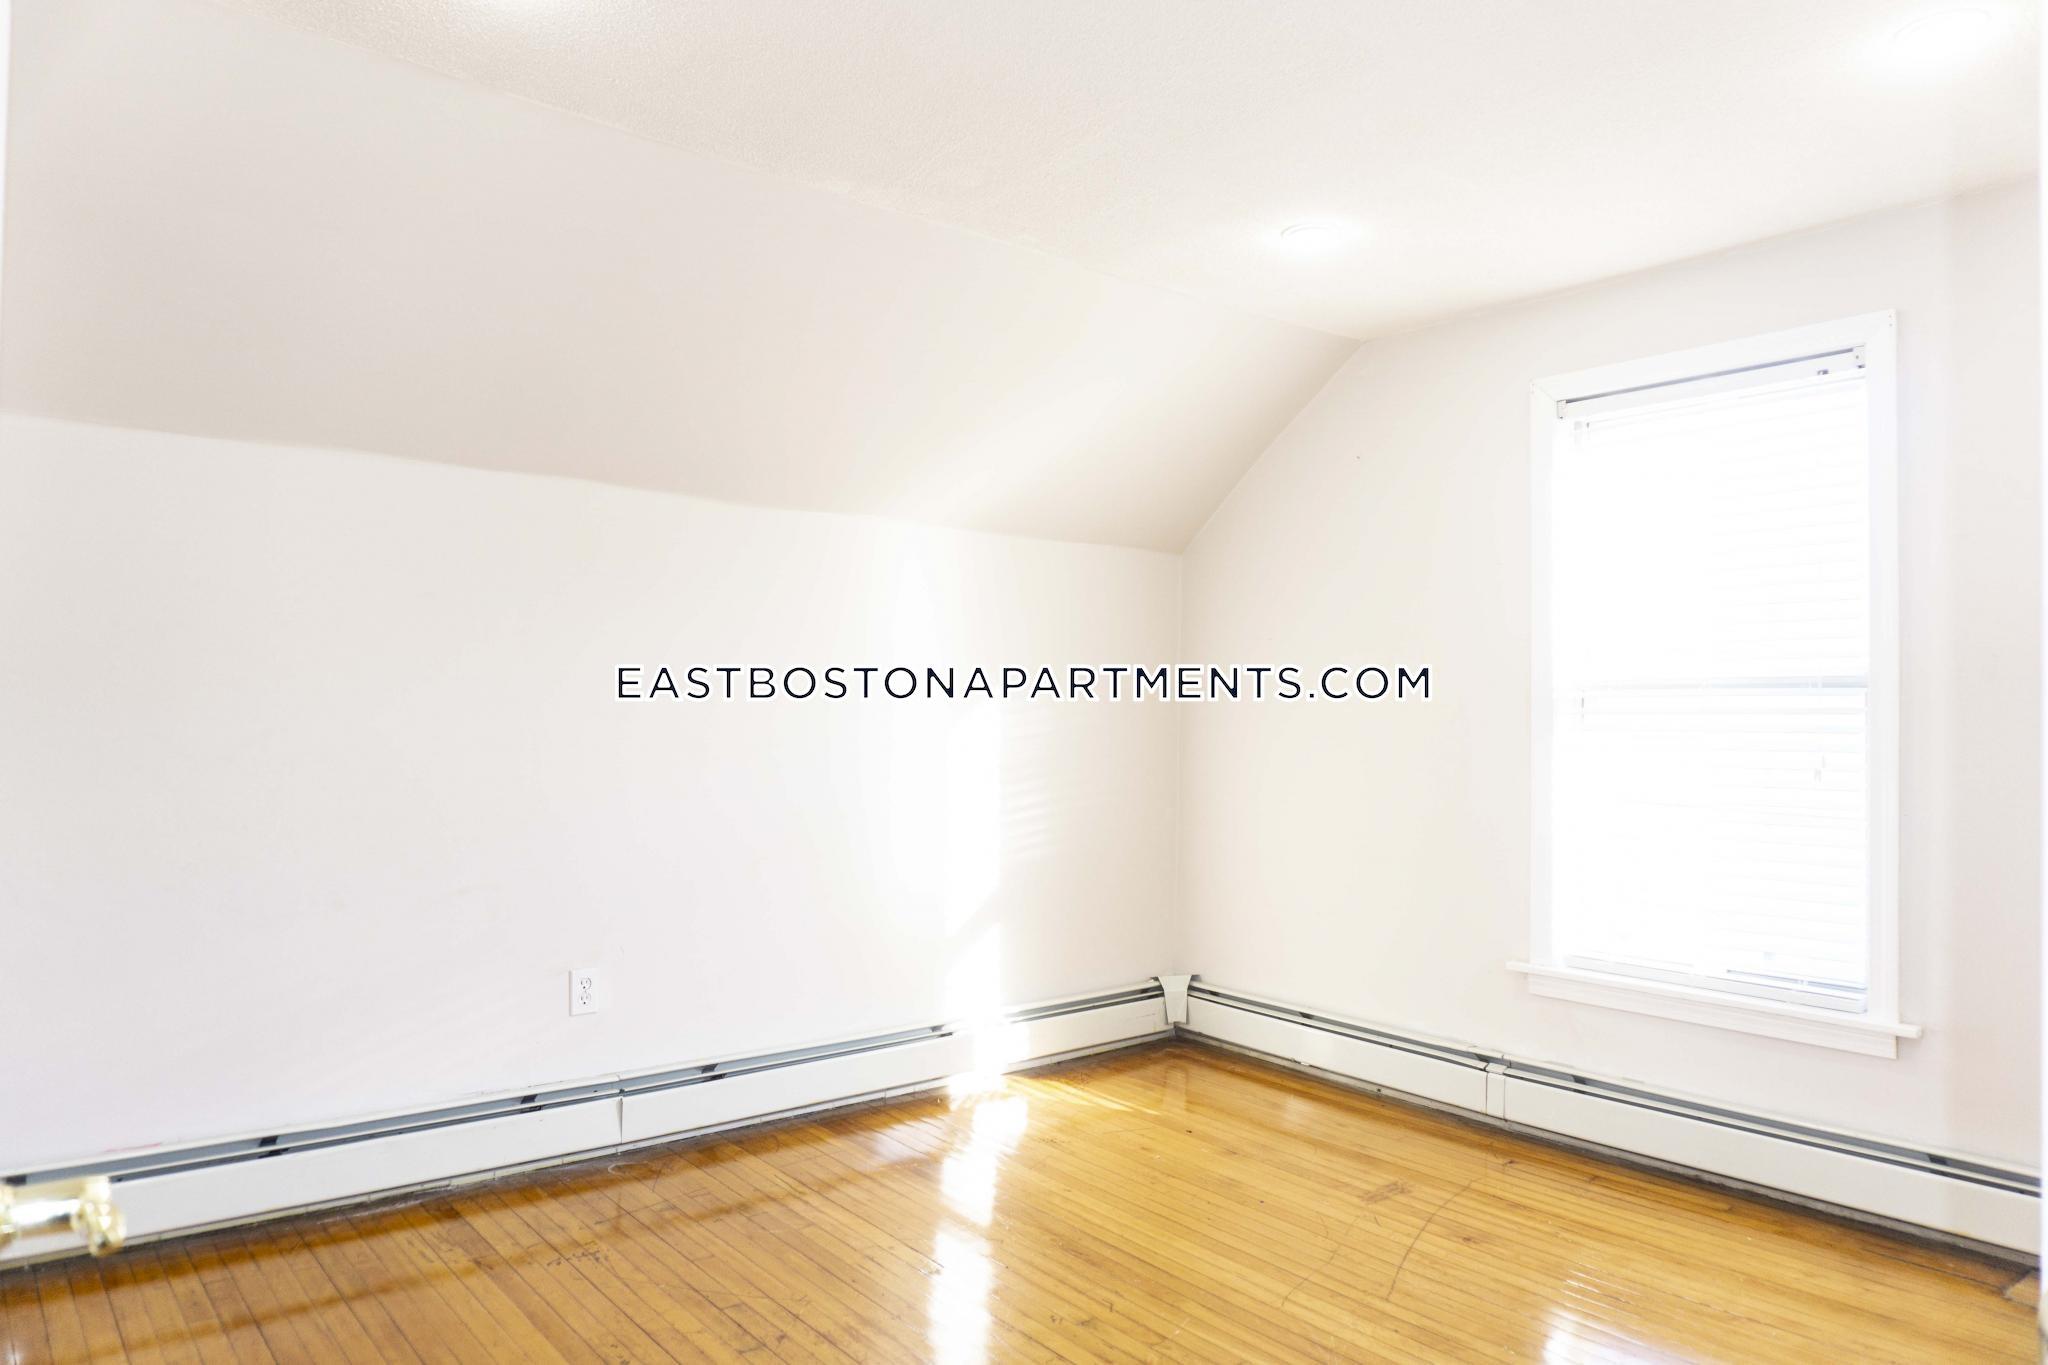 Princeton St. BOSTON - EAST BOSTON - EAGLE HILL